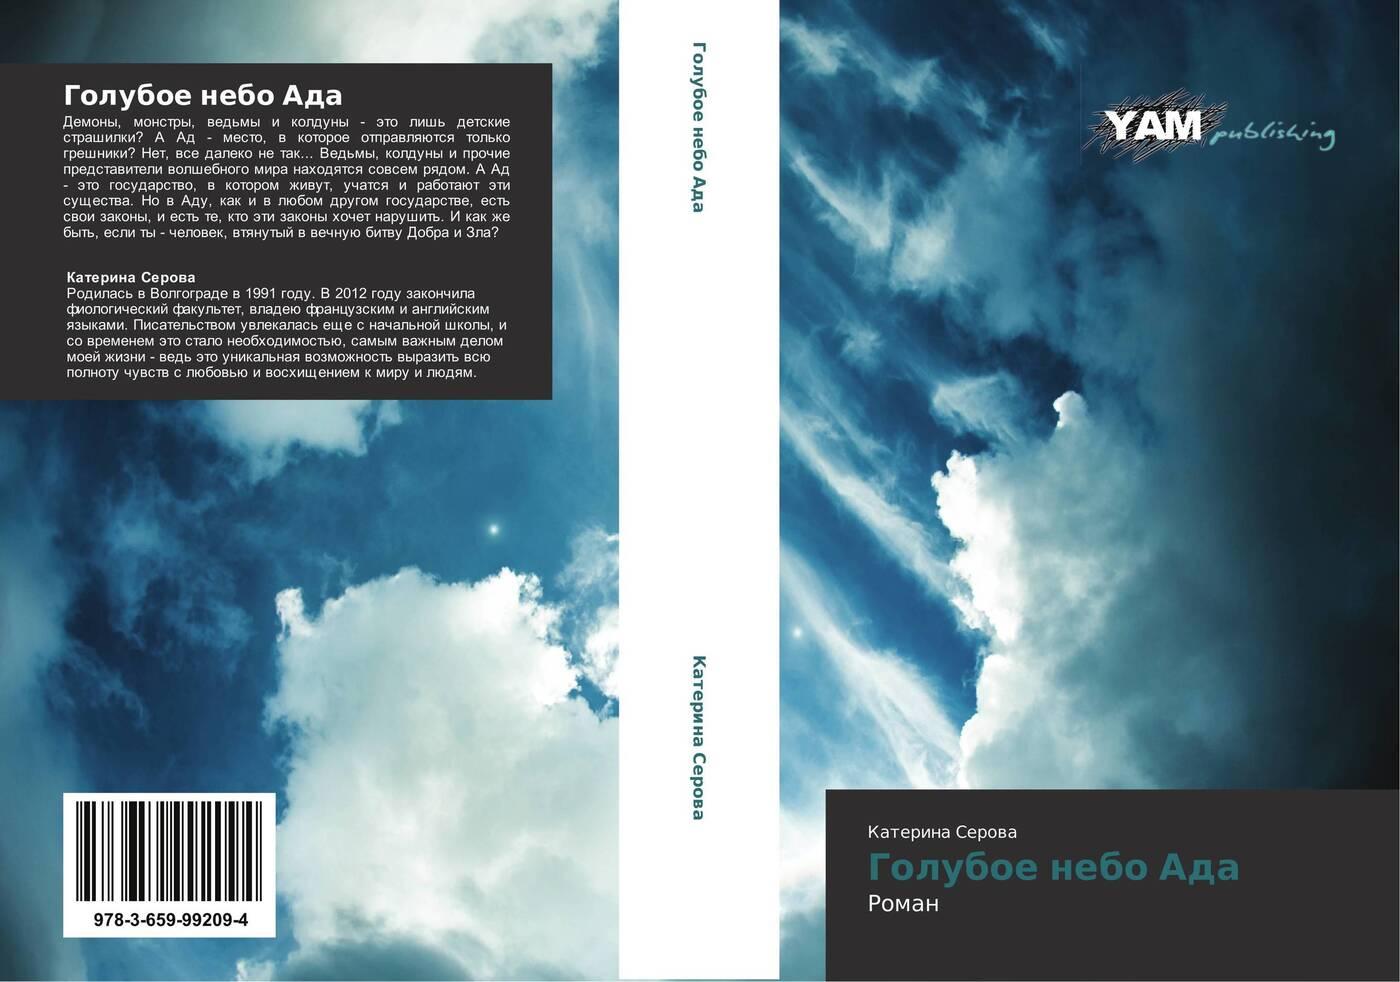 Катерина Серова Голубое небо Ада